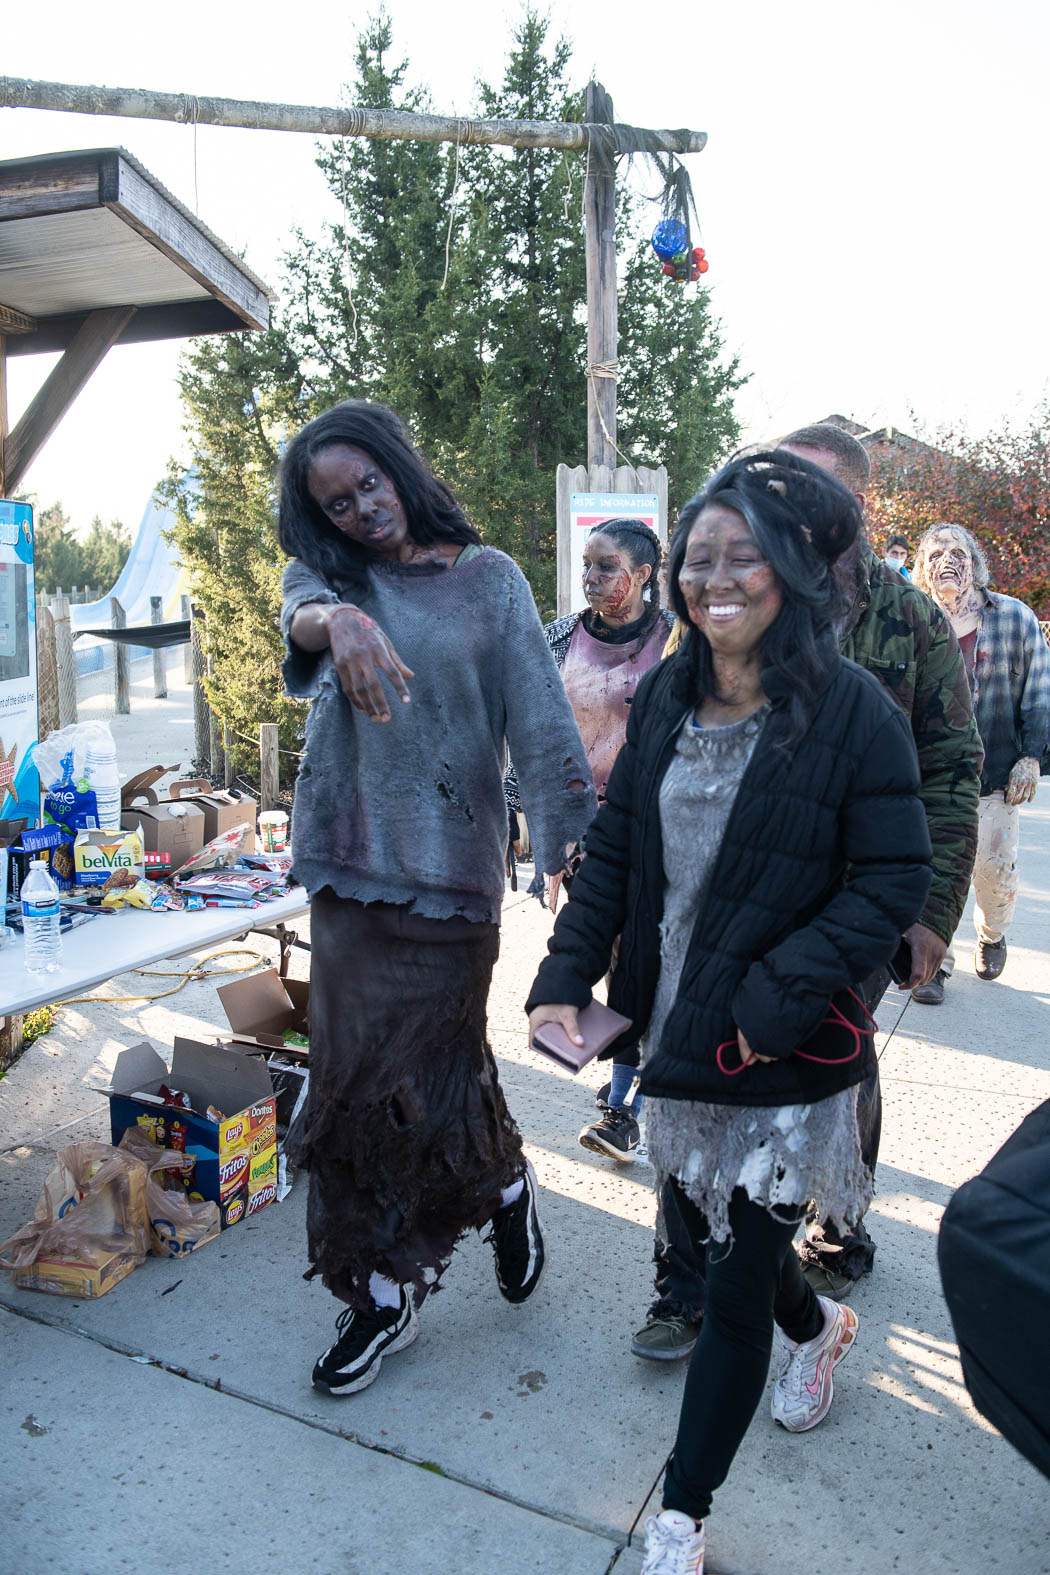 Zombie Team Zombiezi Bay 7190 - Amanda Carberry, Columbus Zoo and Aquarium